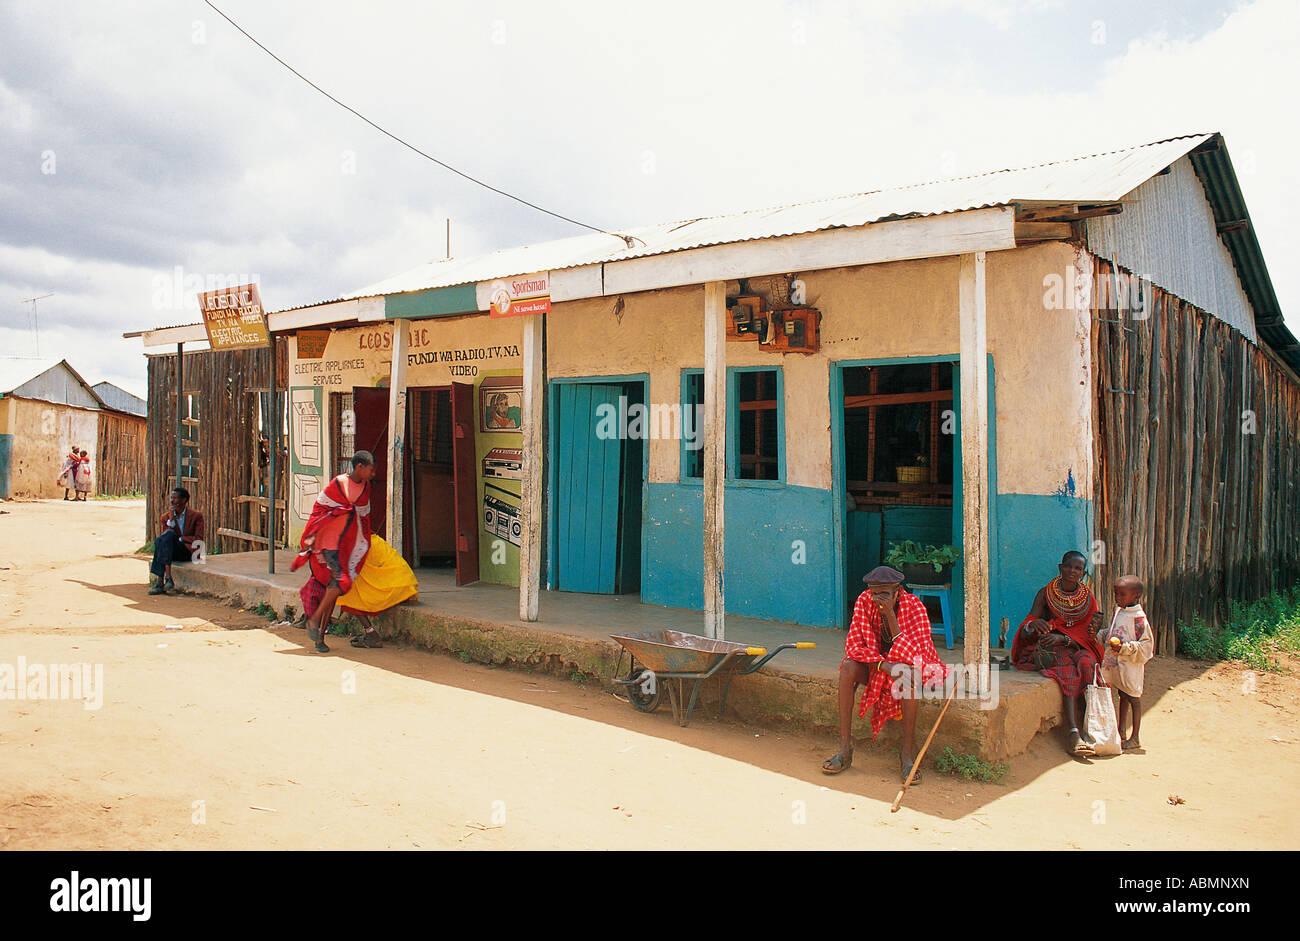 Samburu people near shops in Maralal venue of annual camel derby Northern Kenya - Stock Image